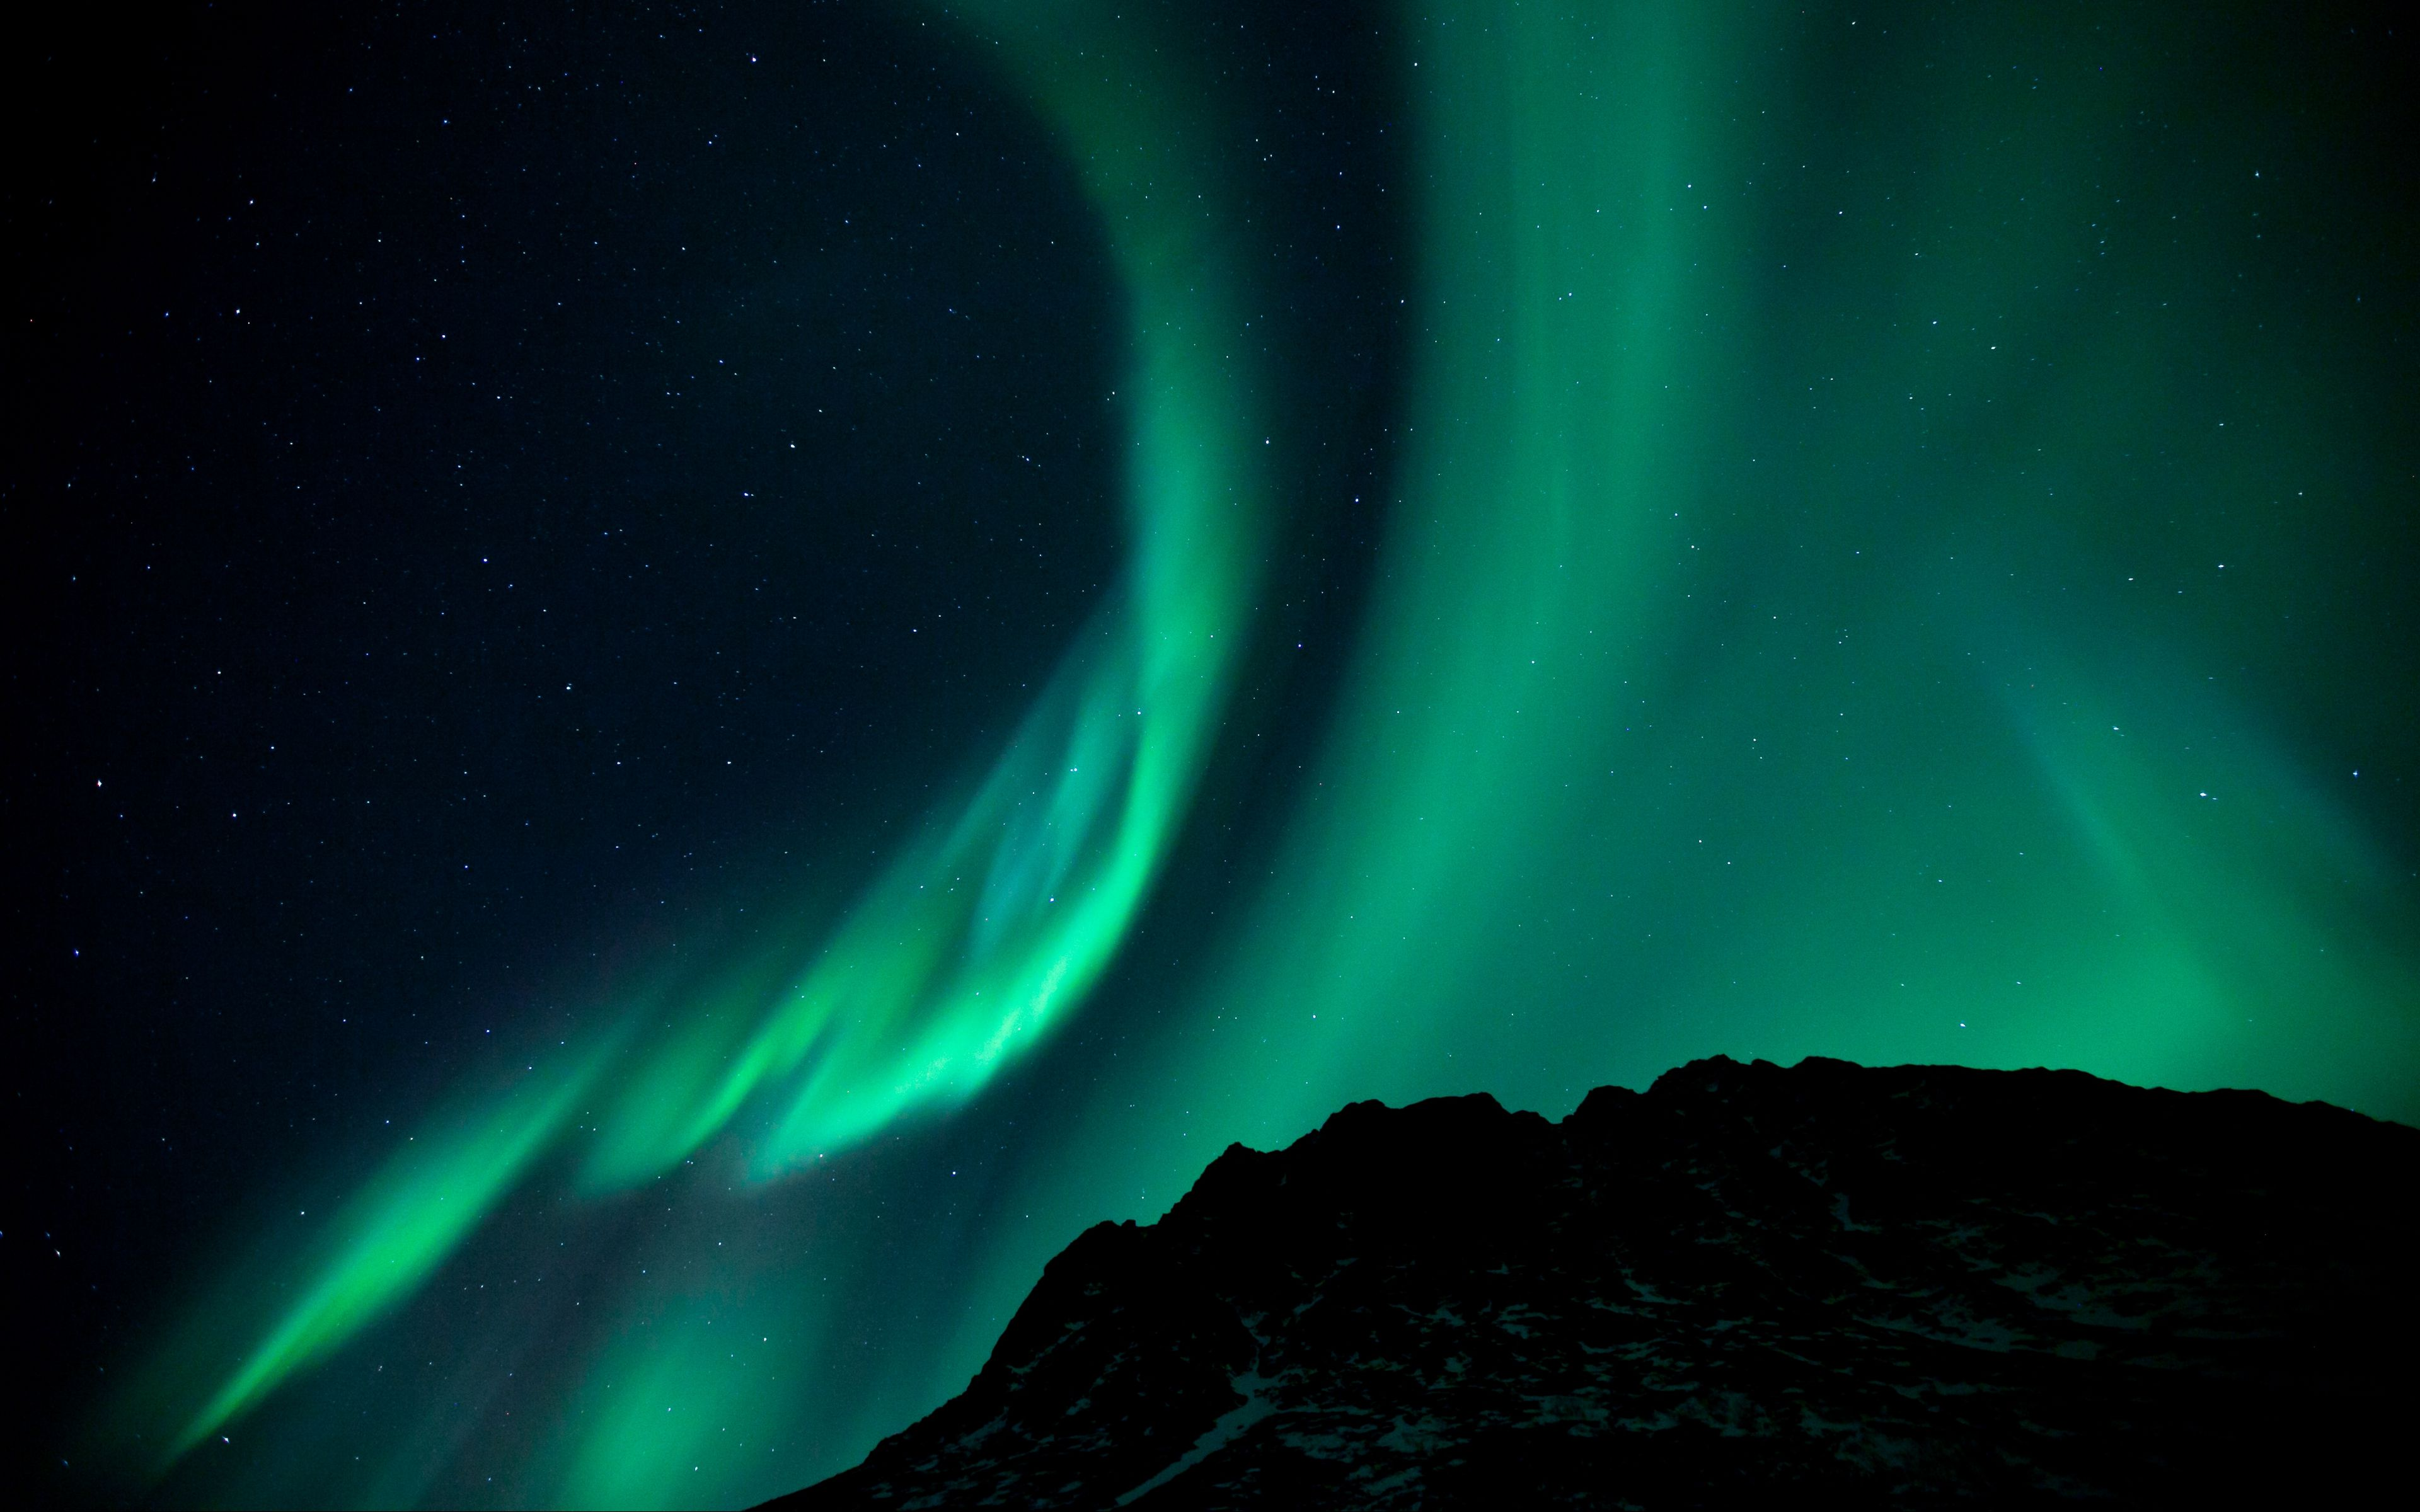 3840x2400 Wallpaper northern lights, night, night sky, phenomenon